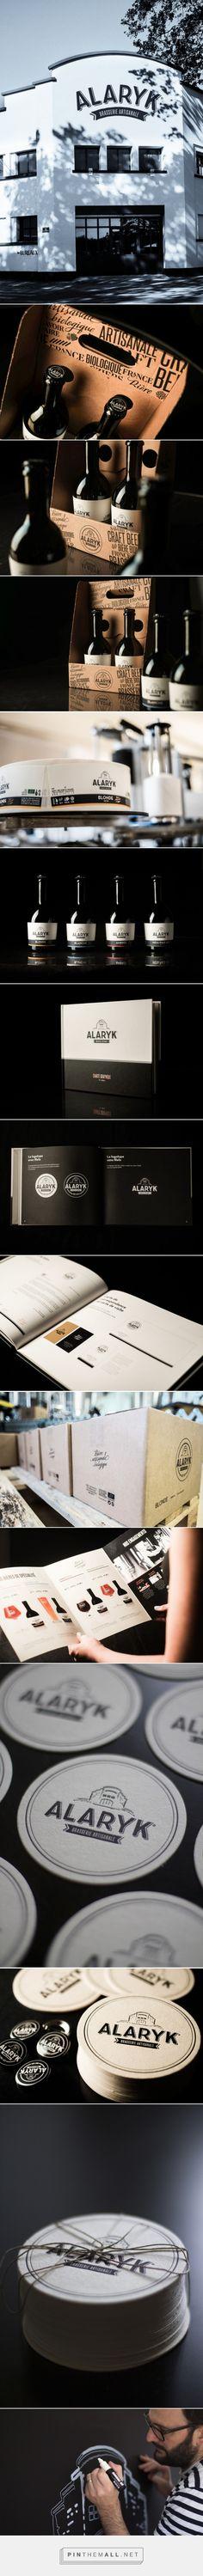 Le studio Àsenso sublime l'identité visuelle de la brasserie Alaryk - created via https://pinthemall.net  #studioasenso #brasserieartisanale #graphisme #imagedemarque #design #bieresartisanales #bieresbiologiques #craftbeer #bieresetgastronomie #savoirfaire #frenchbeer #Alarykbeer #brasserieAlaryk